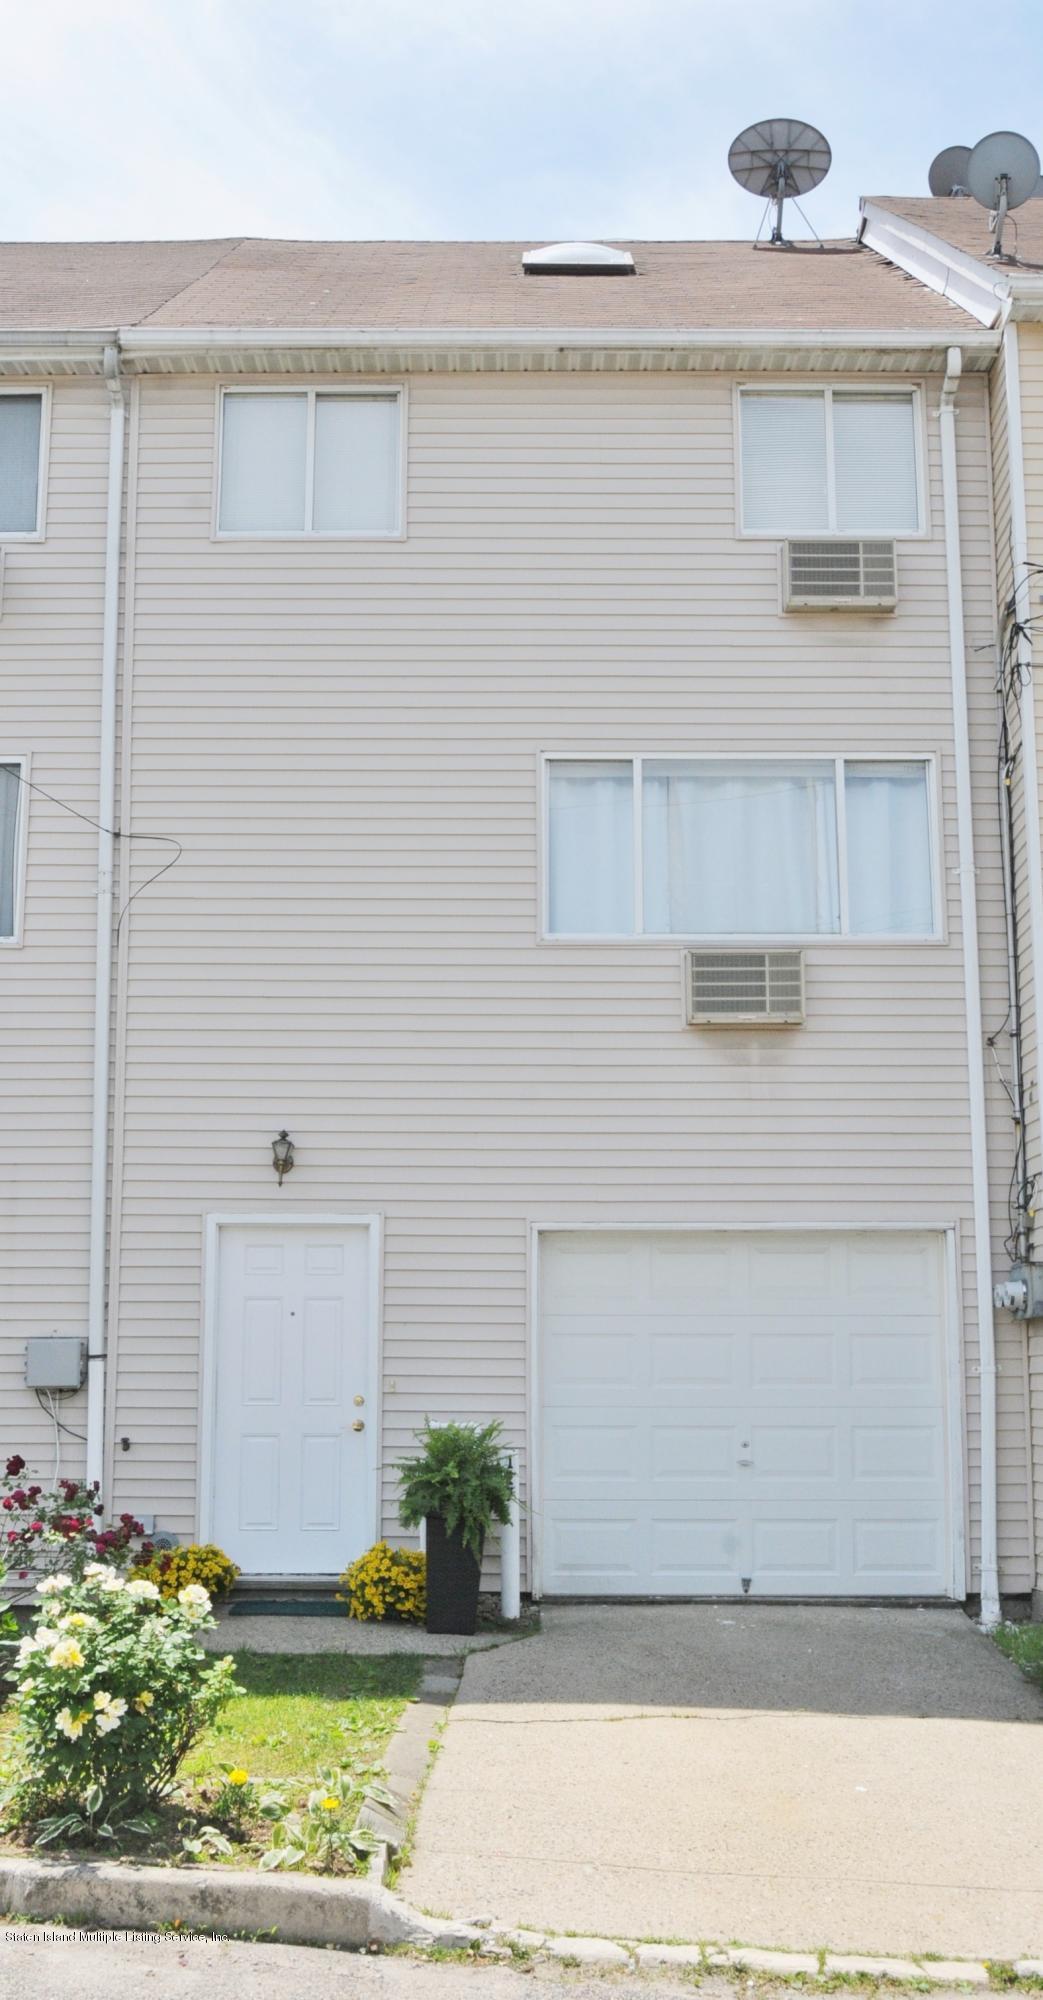 Single Family - Attached 117 Clark Lane  Staten Island, NY 10304, MLS-1129710-2